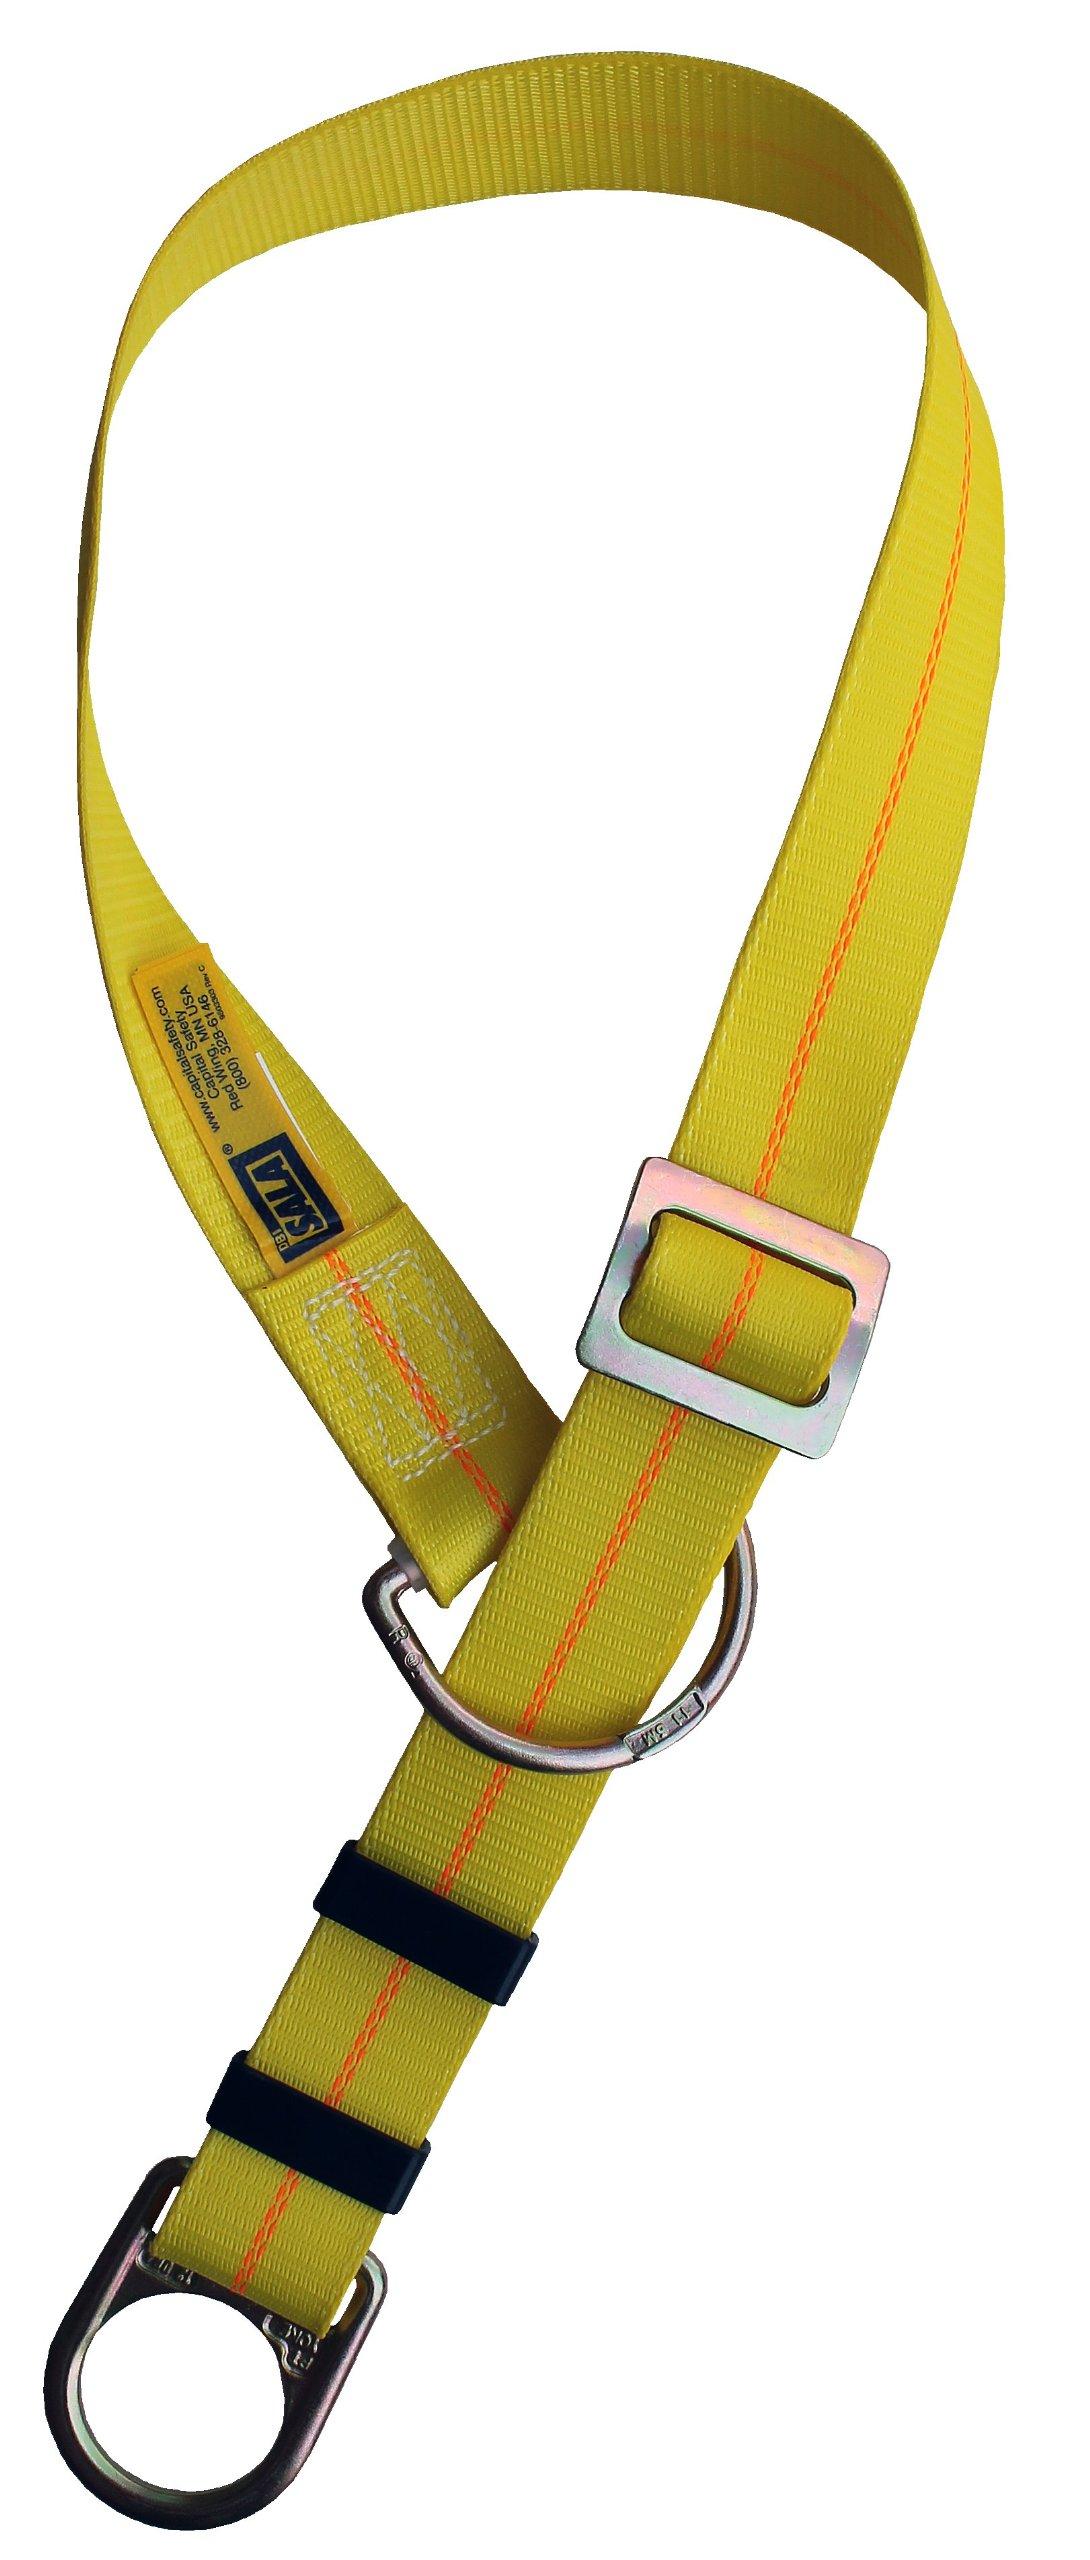 3M DBI-SALA 1002106 Adjustable Tie Off Adaptor, 6', Pass-Thru Type, Yellow